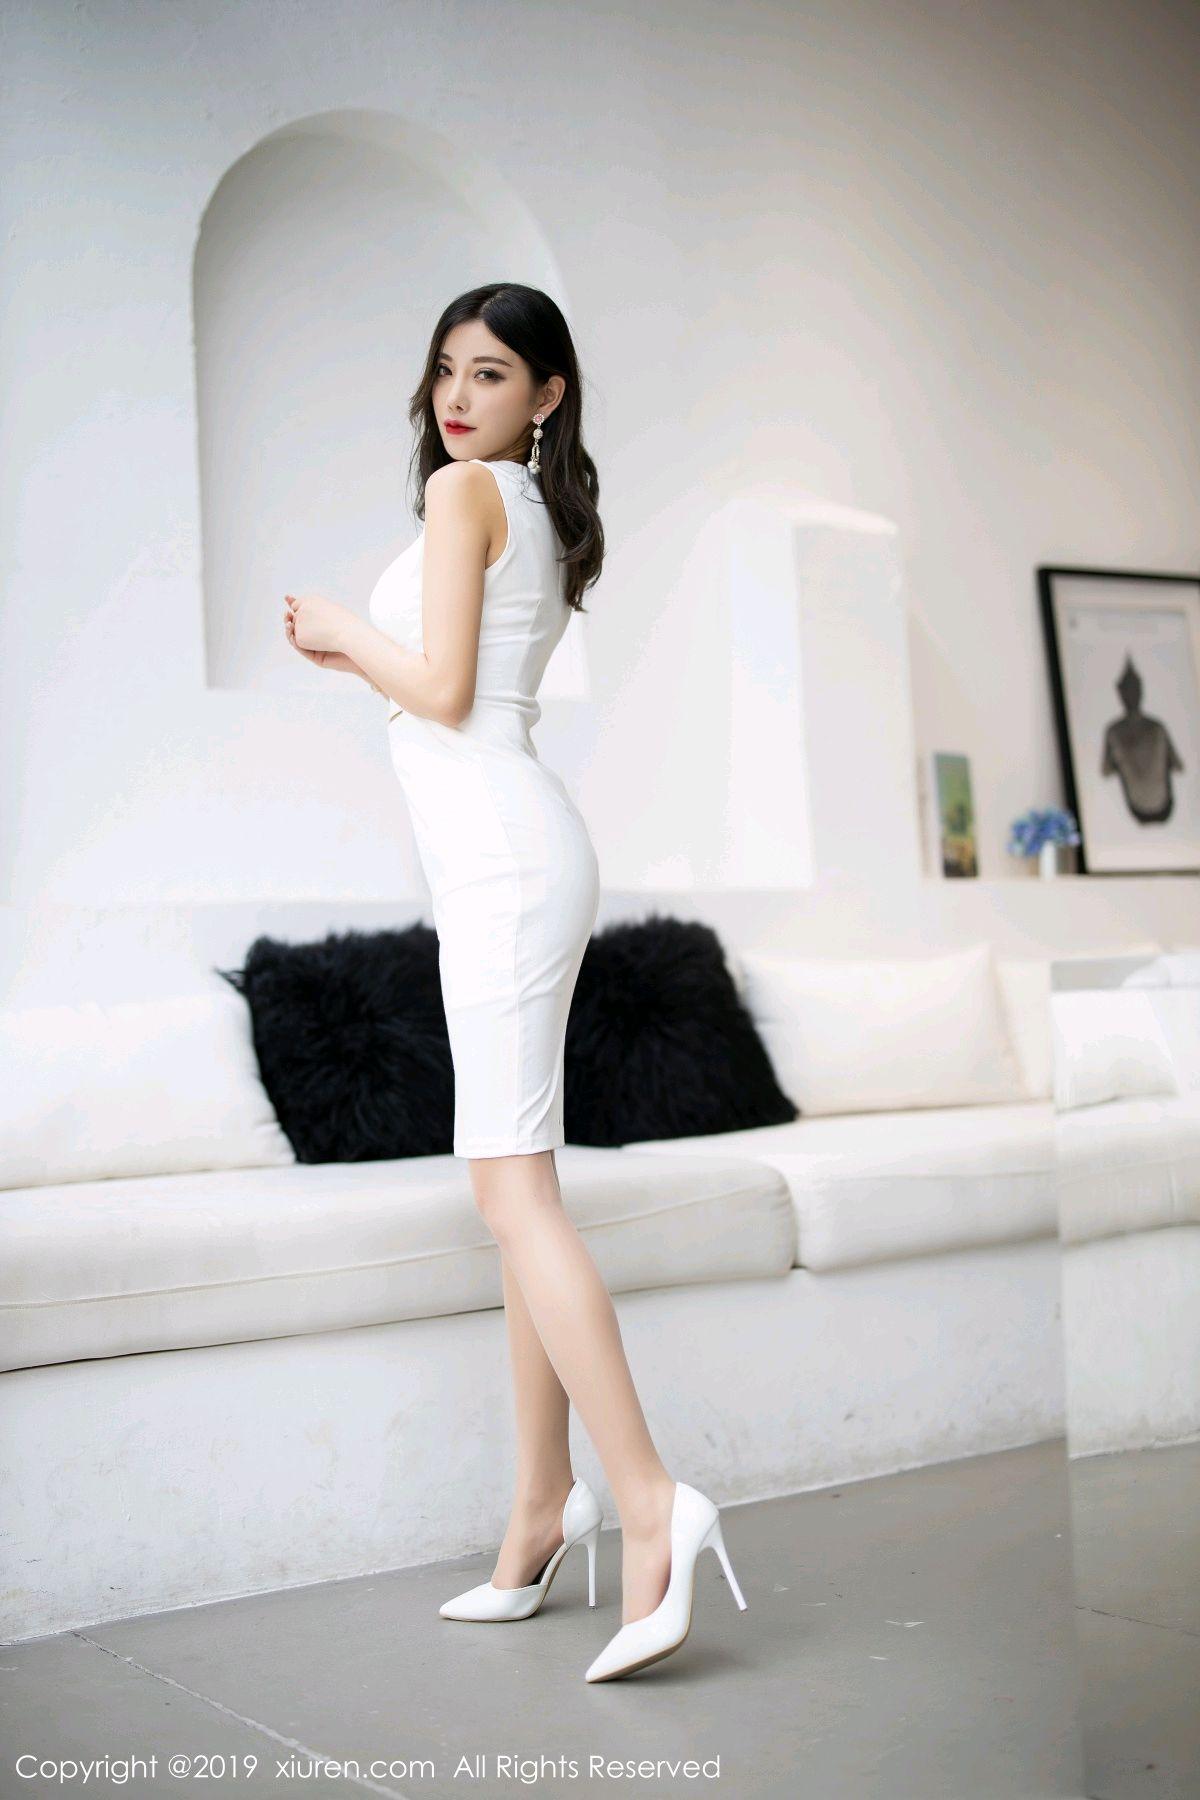 [XiuRen] Vol.1695 Yang Chen Chen 2P, Foot, Tall, Underwear, Xiuren, Yang Chen Chen